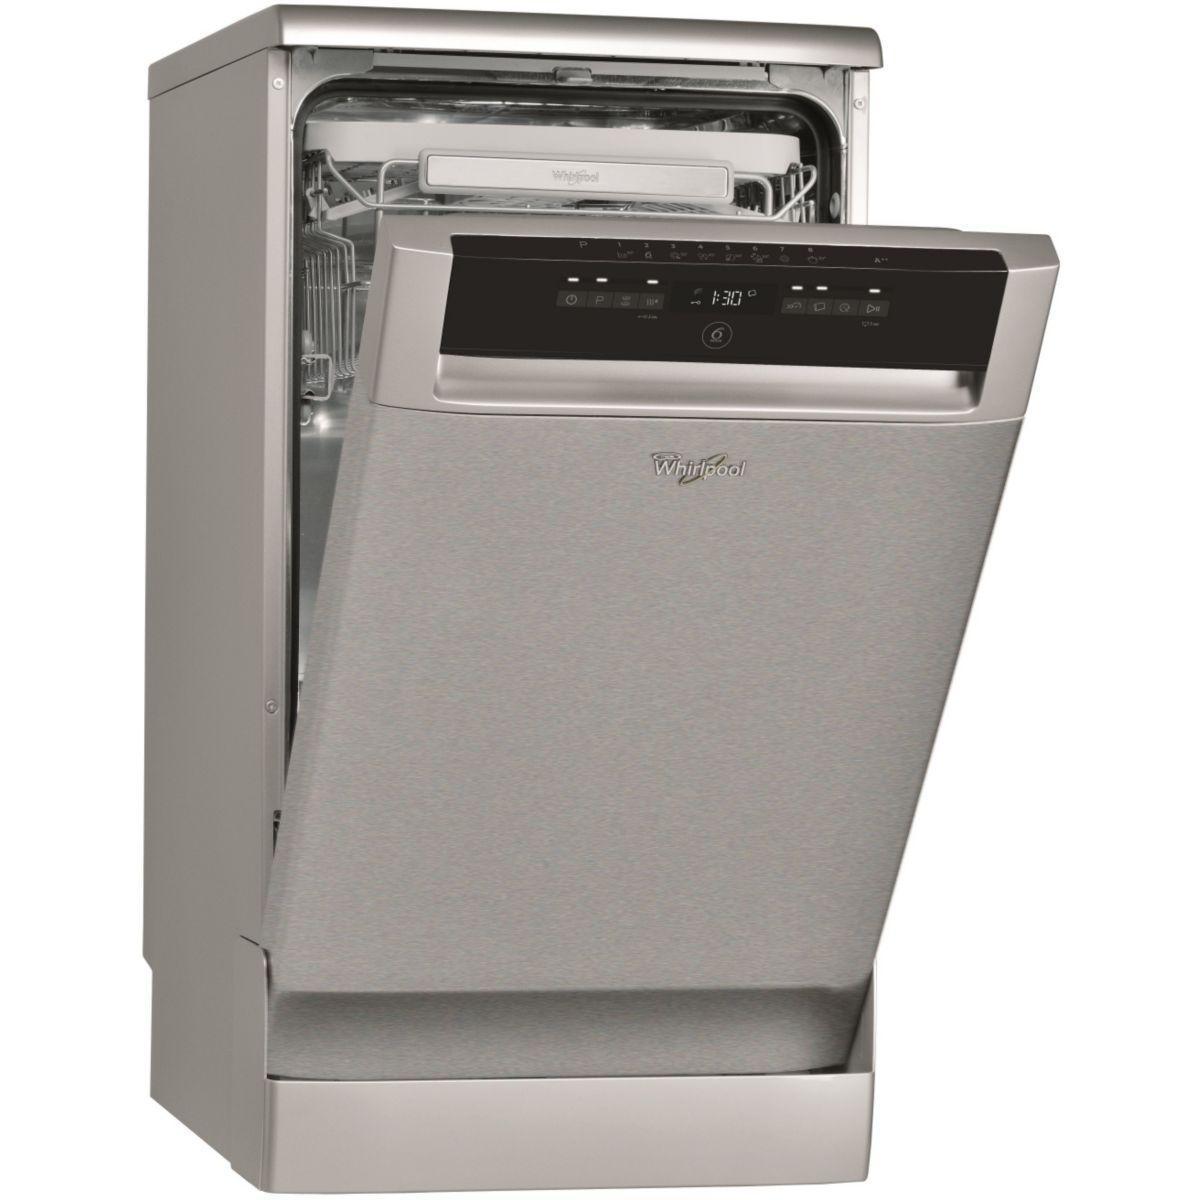 Lave vaisselle 45 cm whirlpool adp 522ix 10 couverts - Lave vaisselle 10 couverts ...